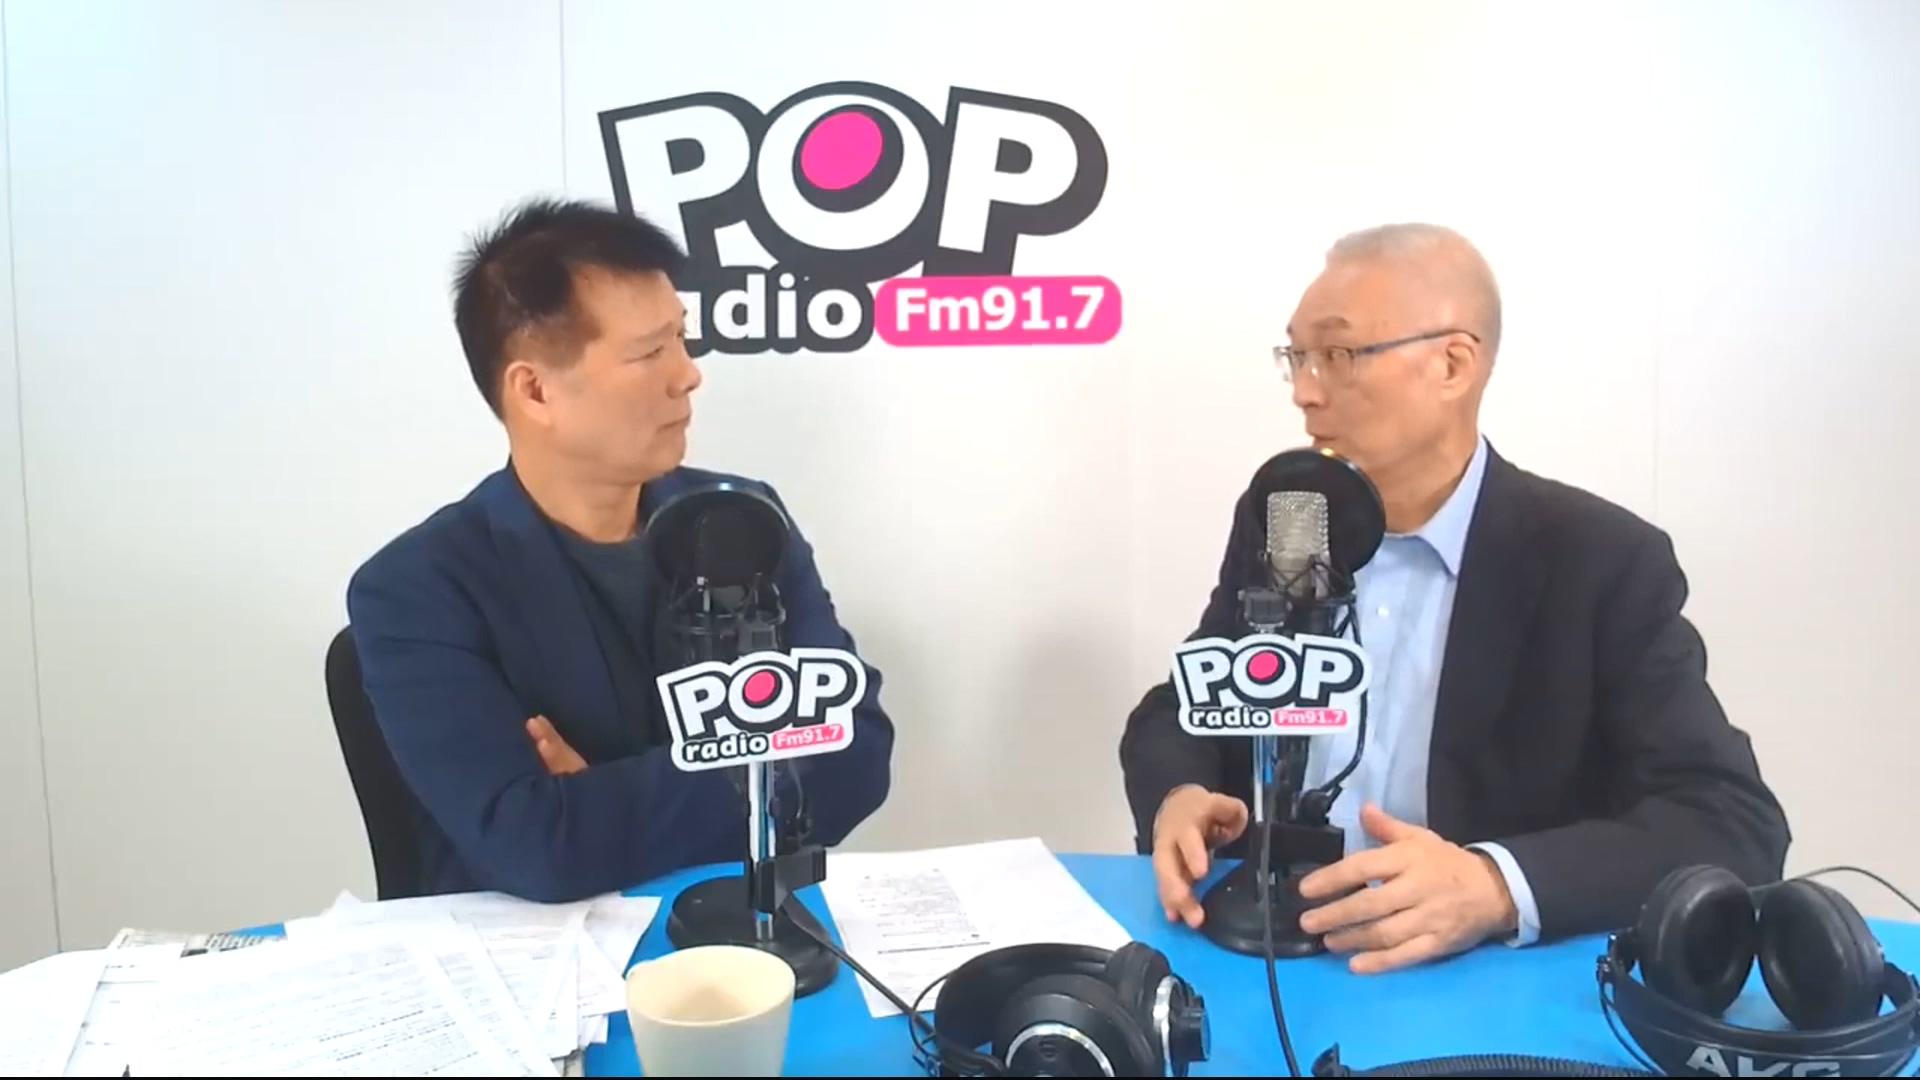 圖/翻攝自POP radio